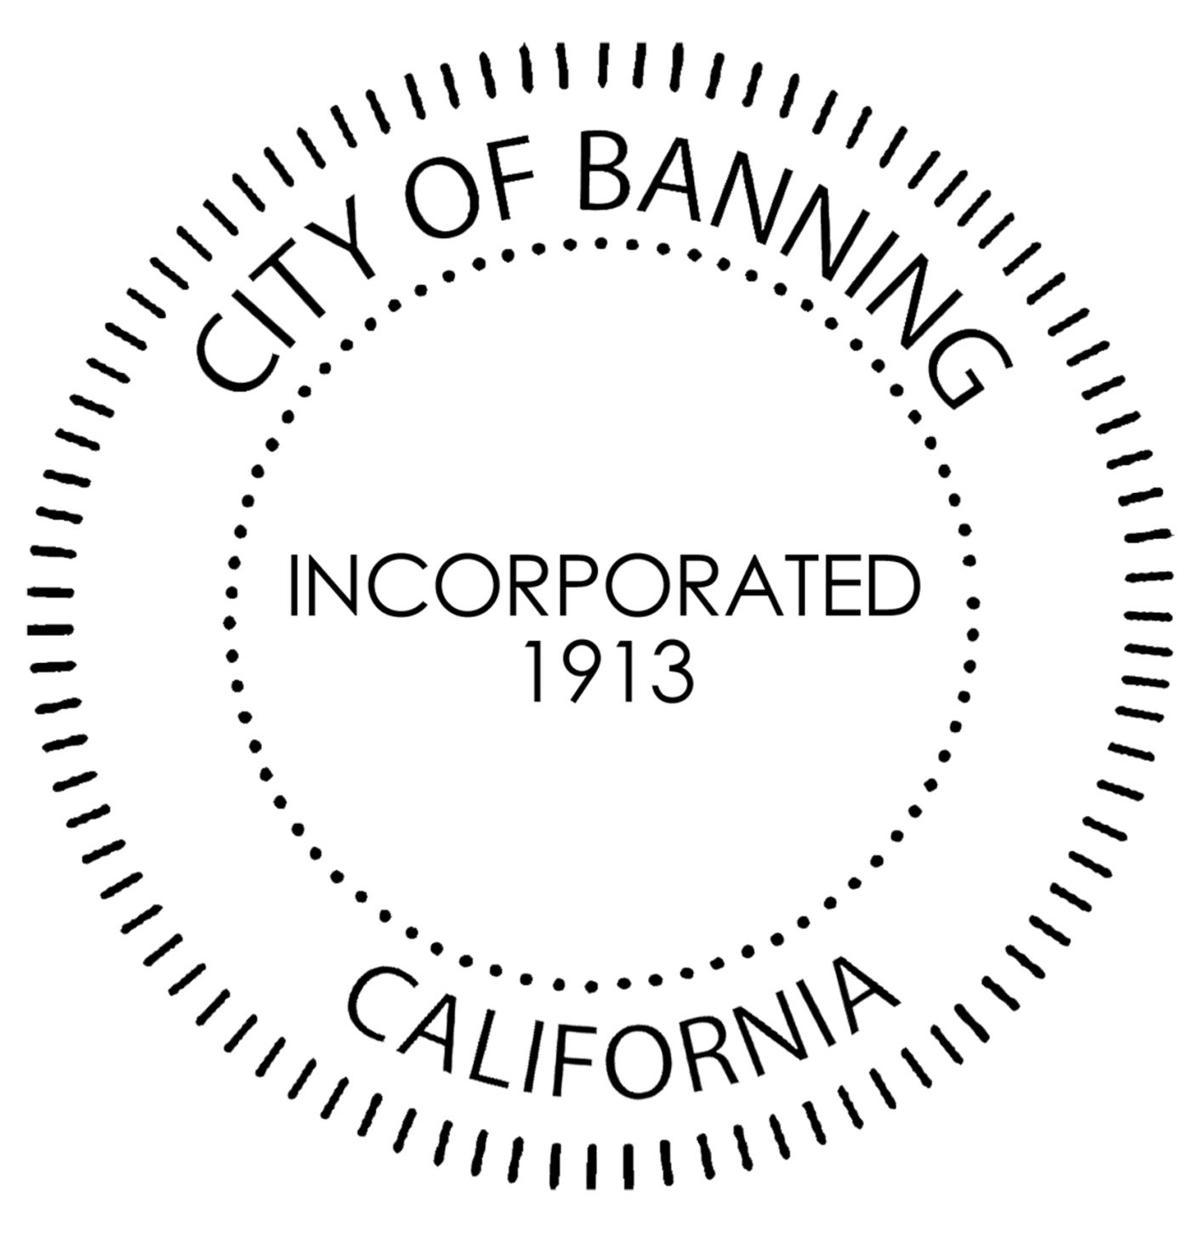 Original city seal